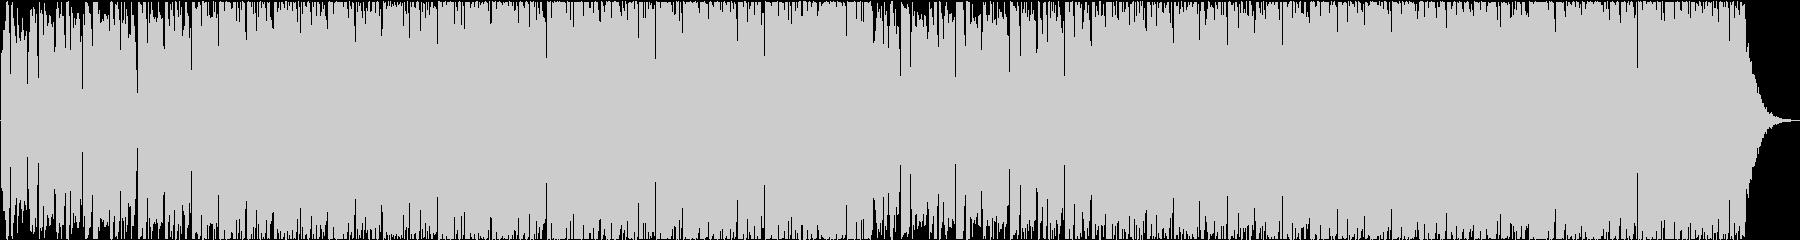 House musicの未再生の波形